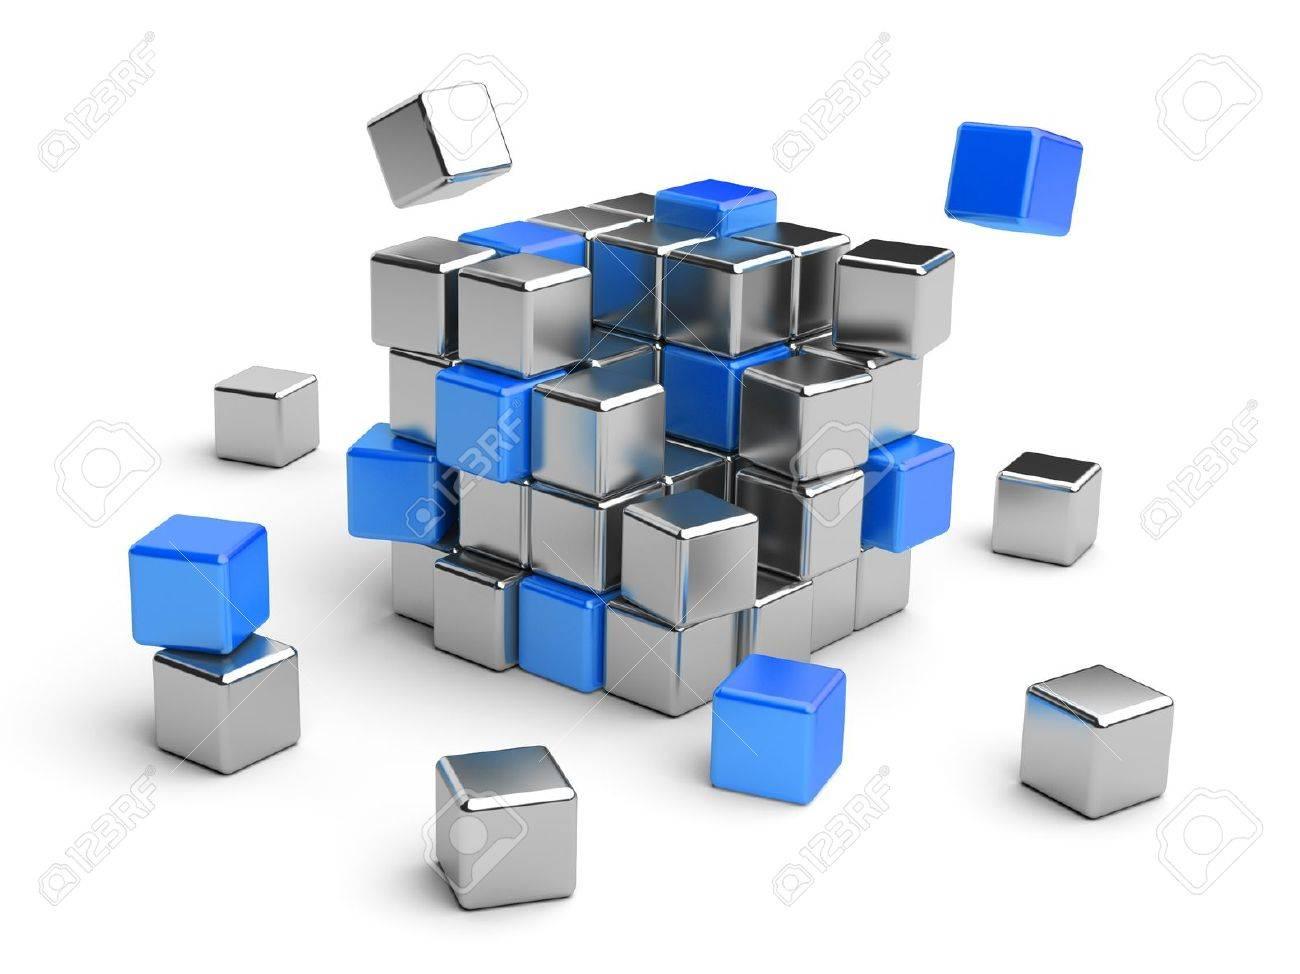 cube assembling from blocks 3d illustration isolated on white stock